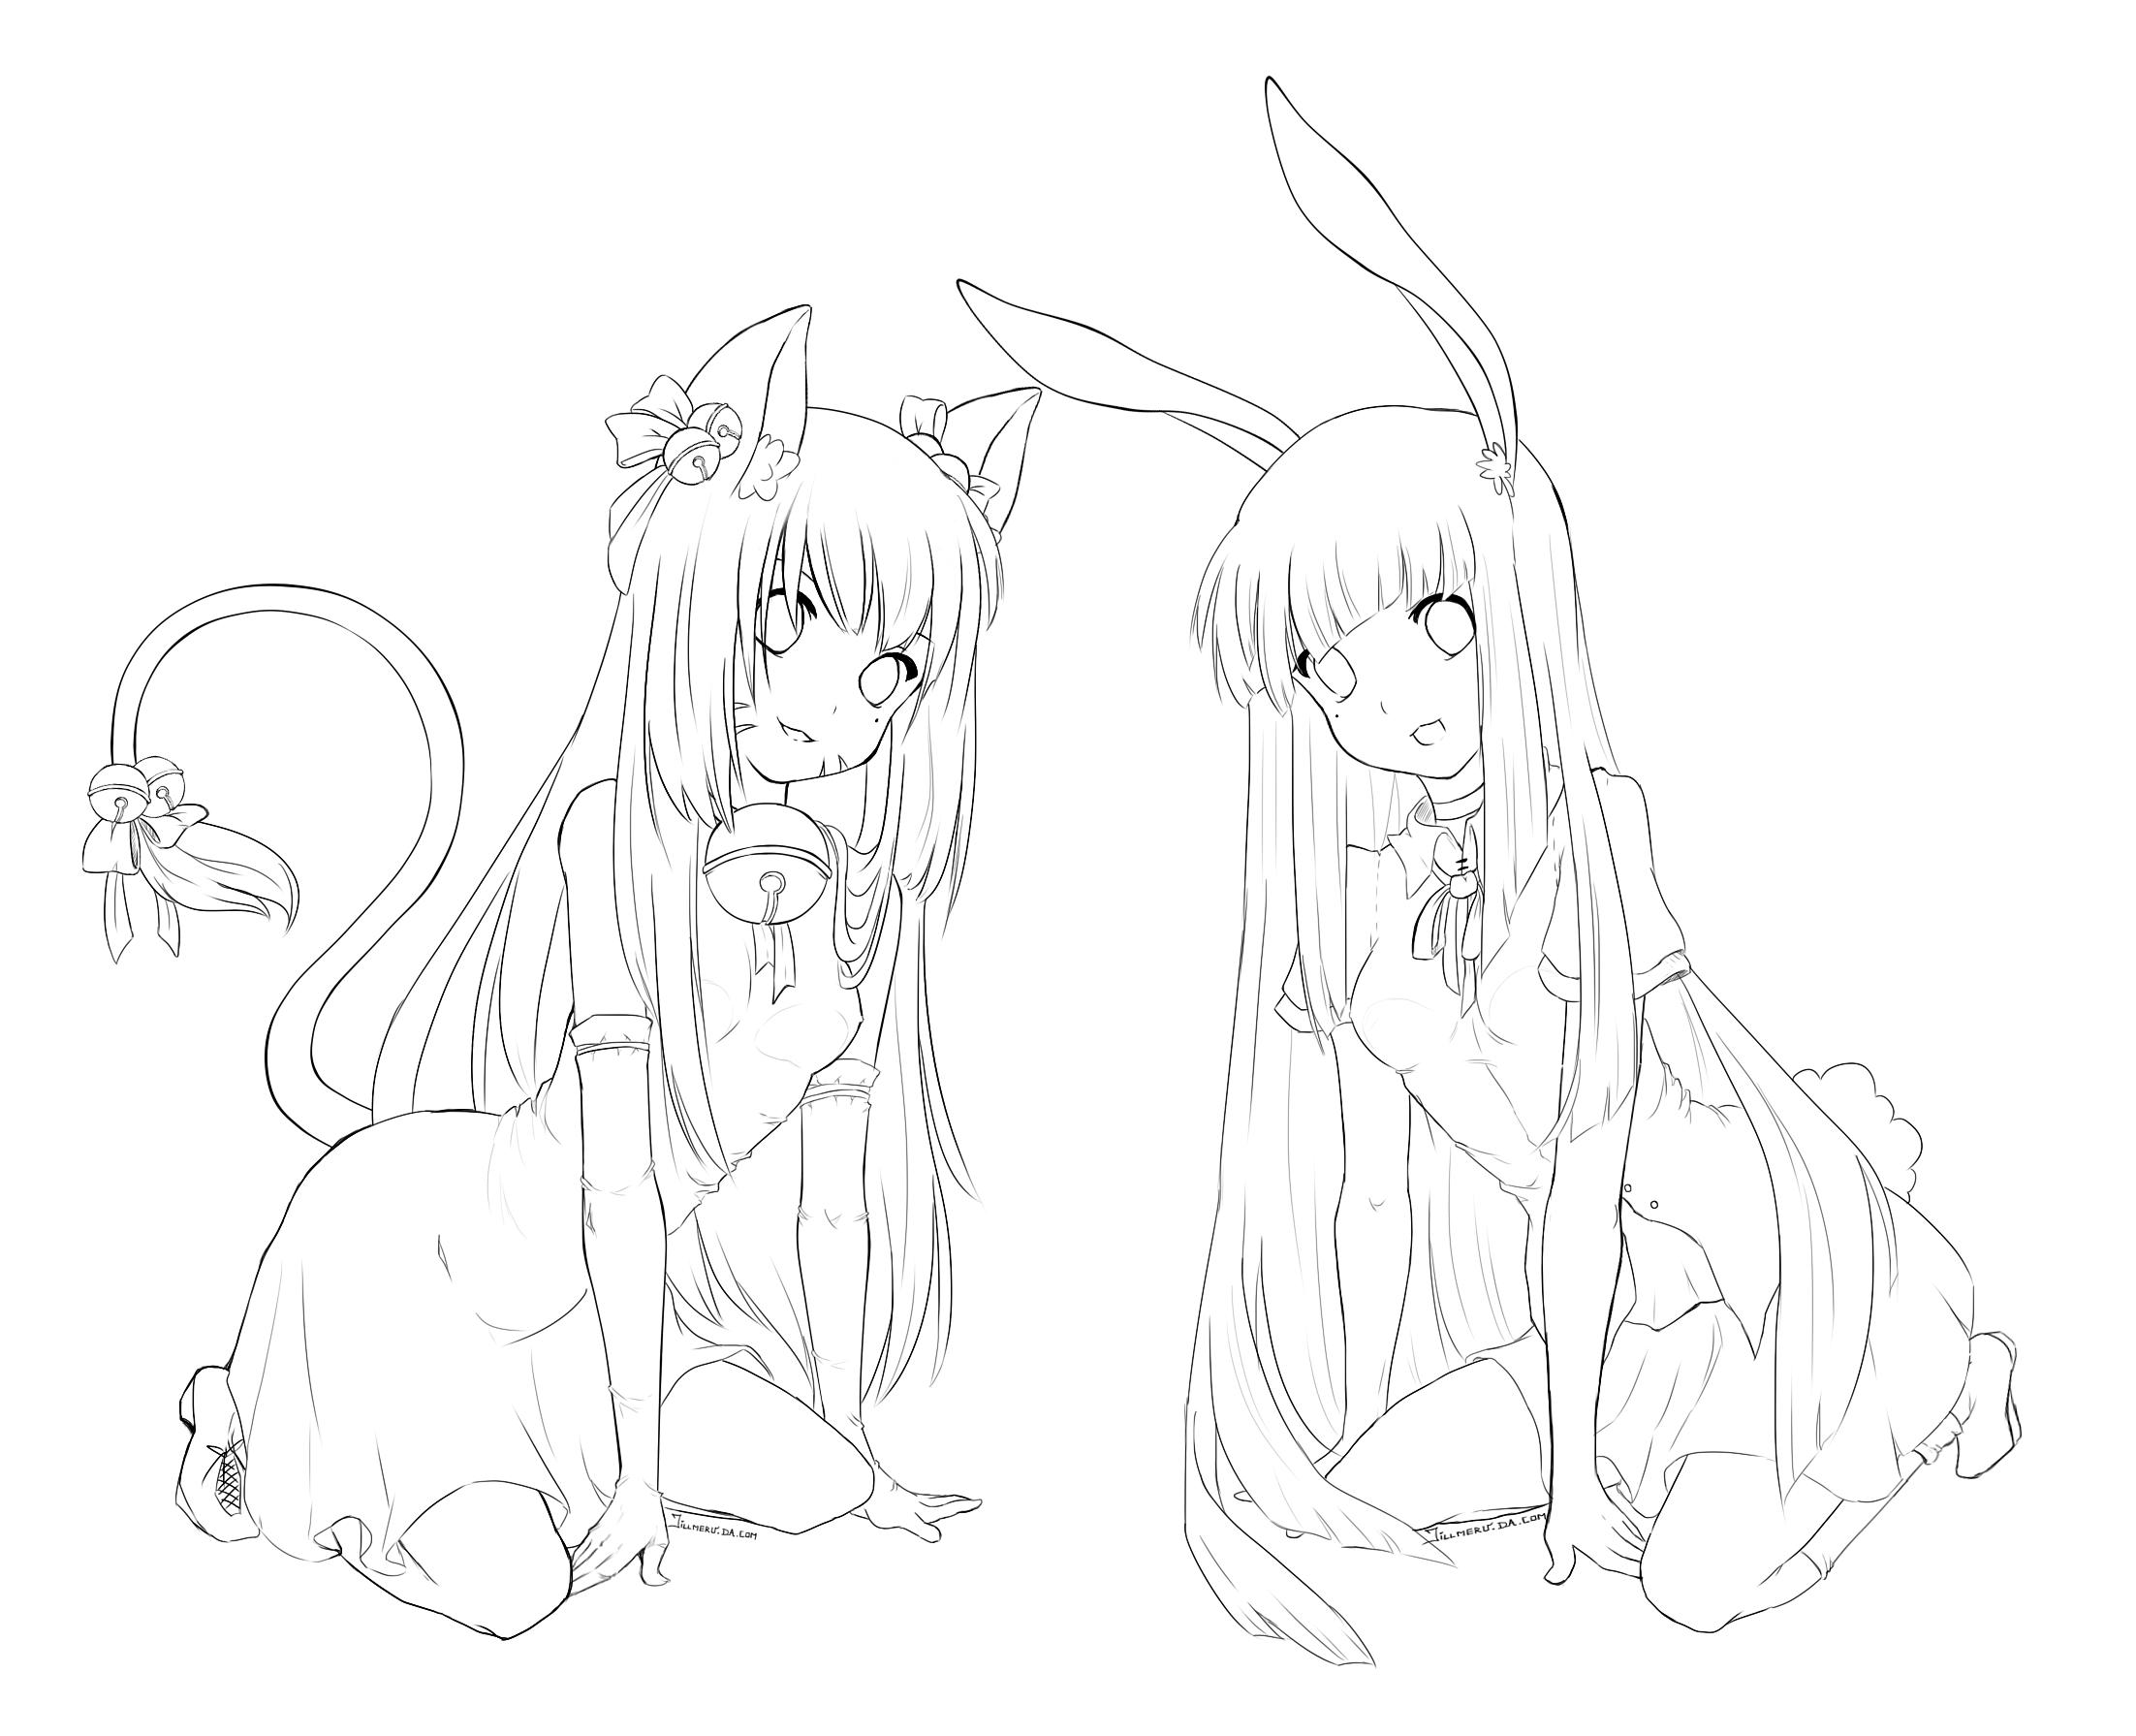 Cat and Bunny Free Lineart by Jillmeru.deviantart.com on ...